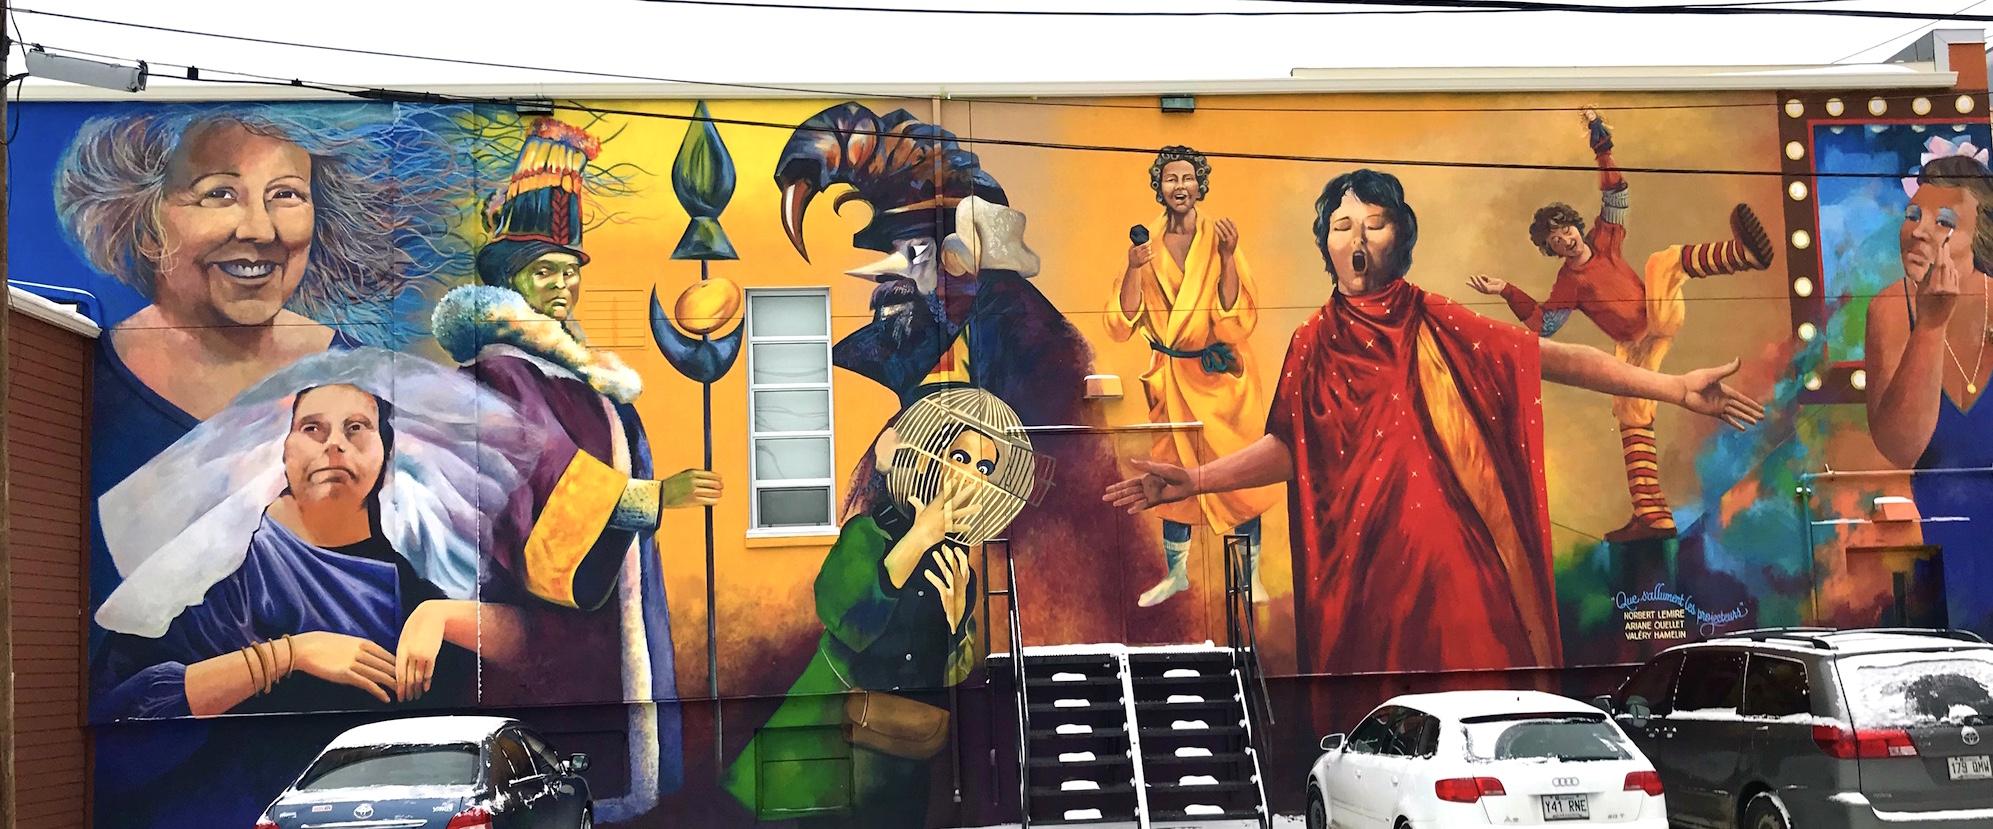 murale art public Petit Théâtre Noranda Abitibi-Témiscamingue